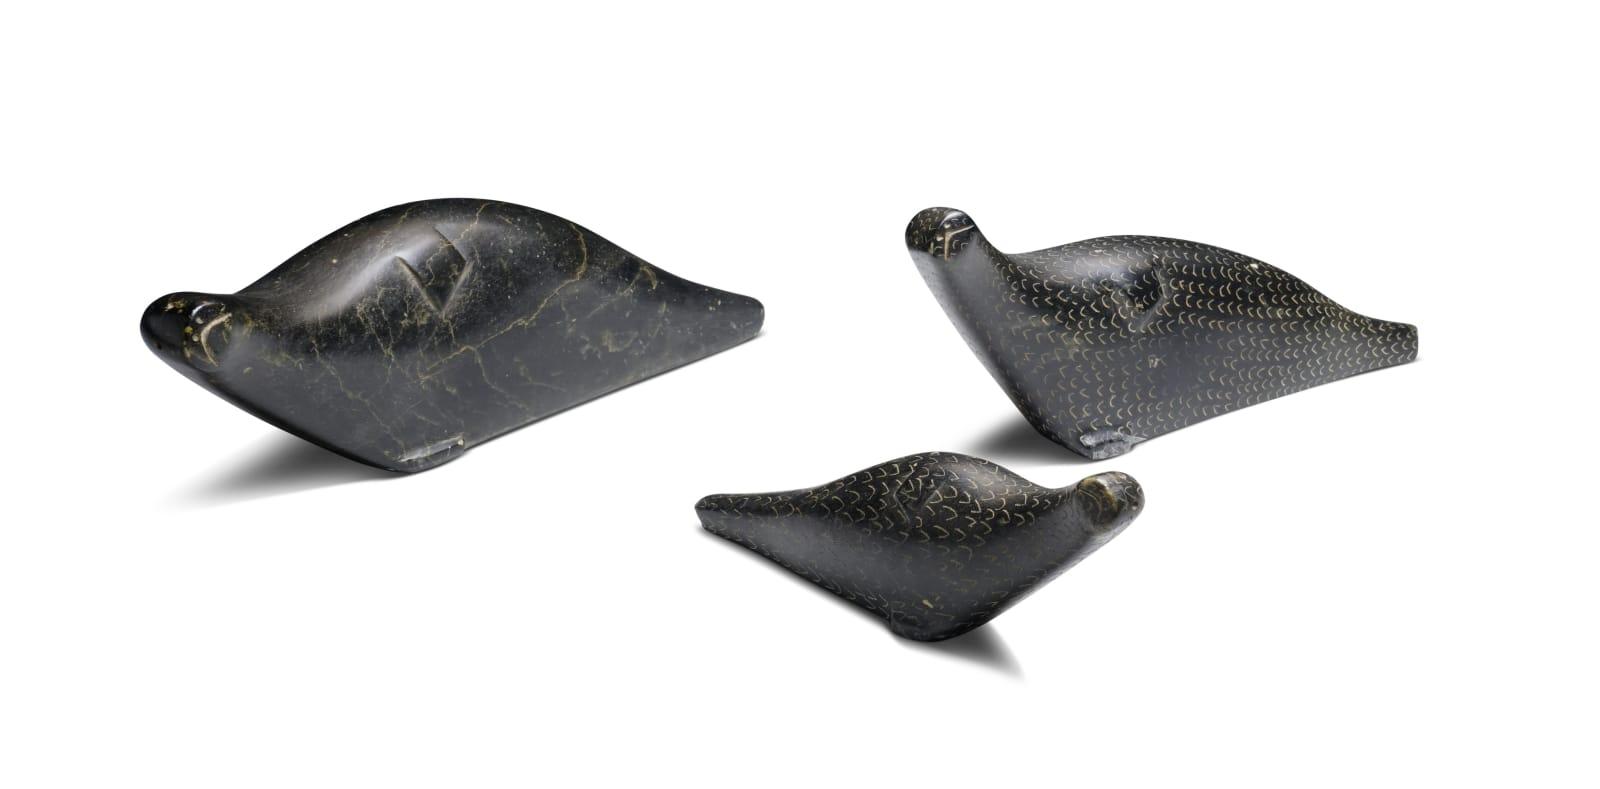 NINGEOSEAK PETER (1937-) KINNGAIT (CAPE DORSET) Three Basking Seals, 1963 each stone, largest: 2 1/2 x 8 1/4 x 1 1/2 in (6.3 x 21 x 3.8 cm) and smaller ESTIMATE: $600 — $900 New Price: $400